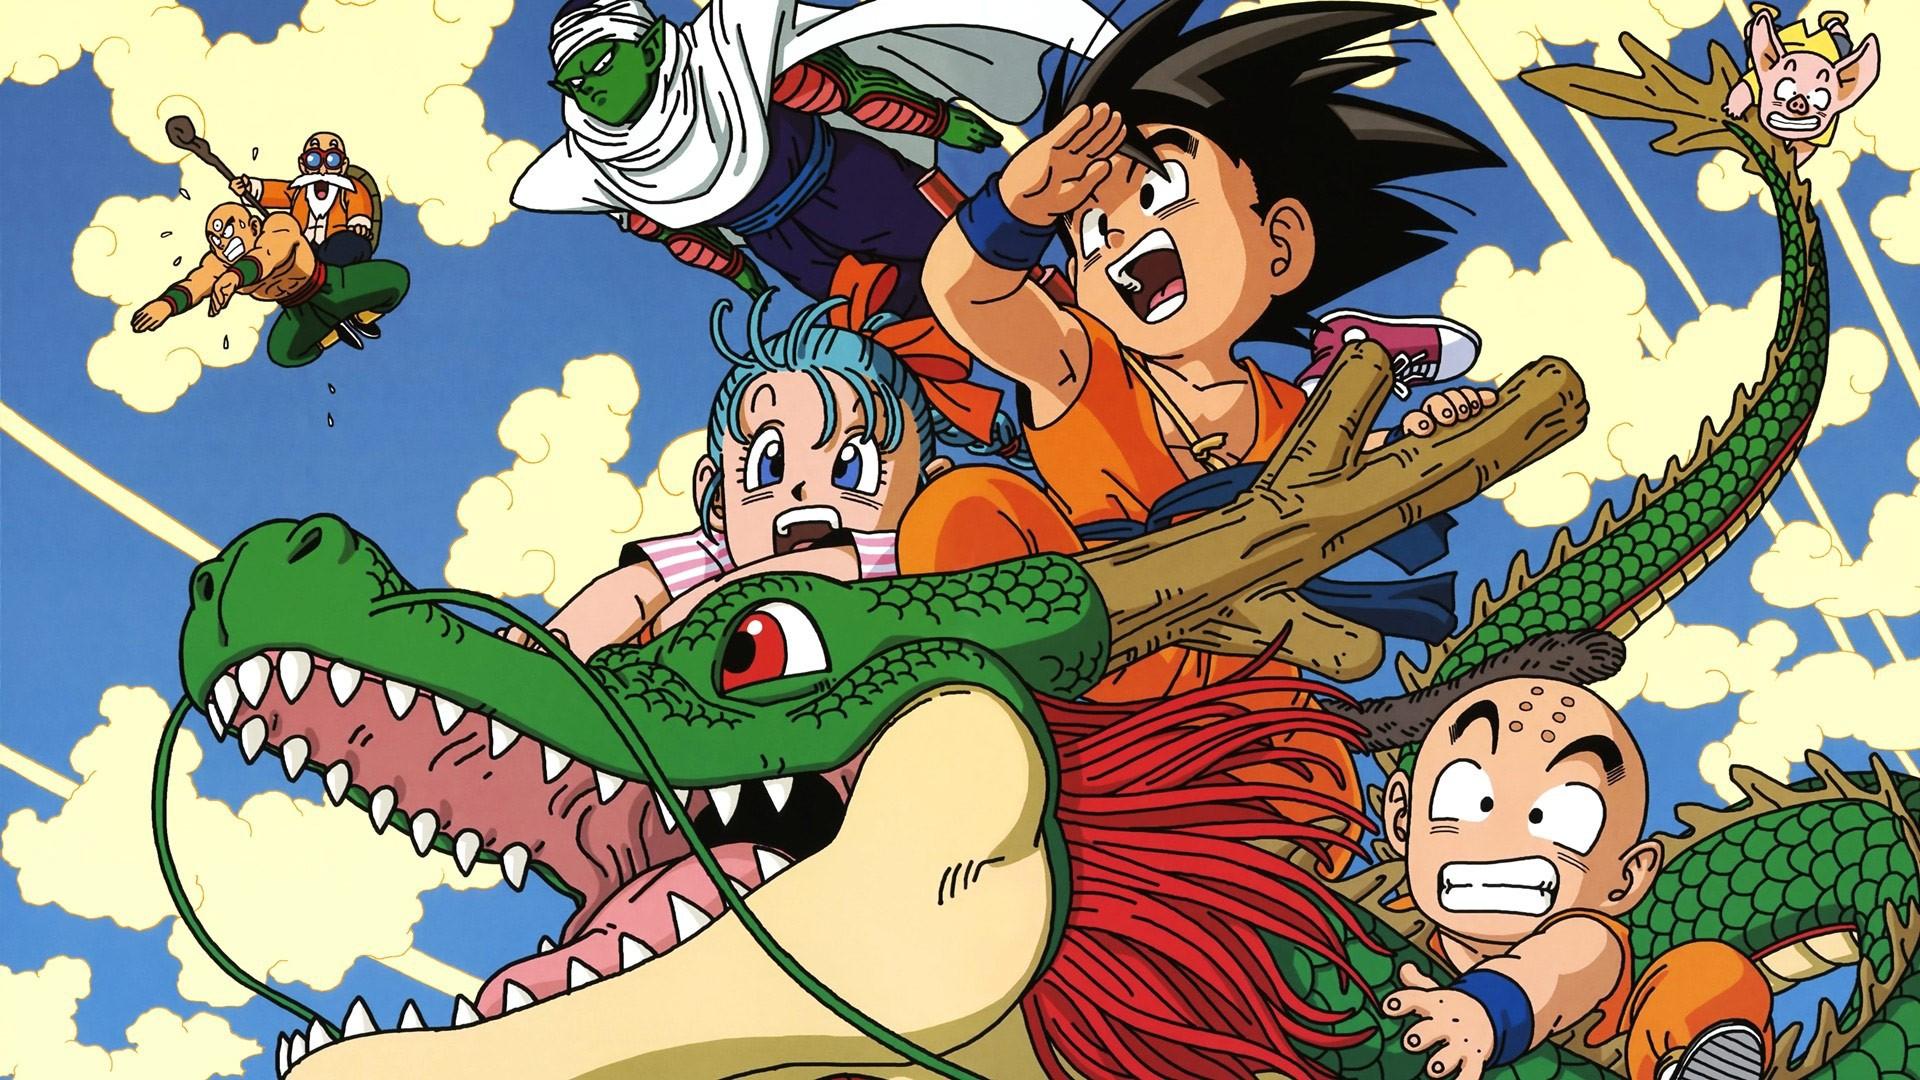 Liste Des Épisodes De Dragon Ball / Dbz / Db Gt / Kai destiné Dessin Animé De Dragon Ball Z